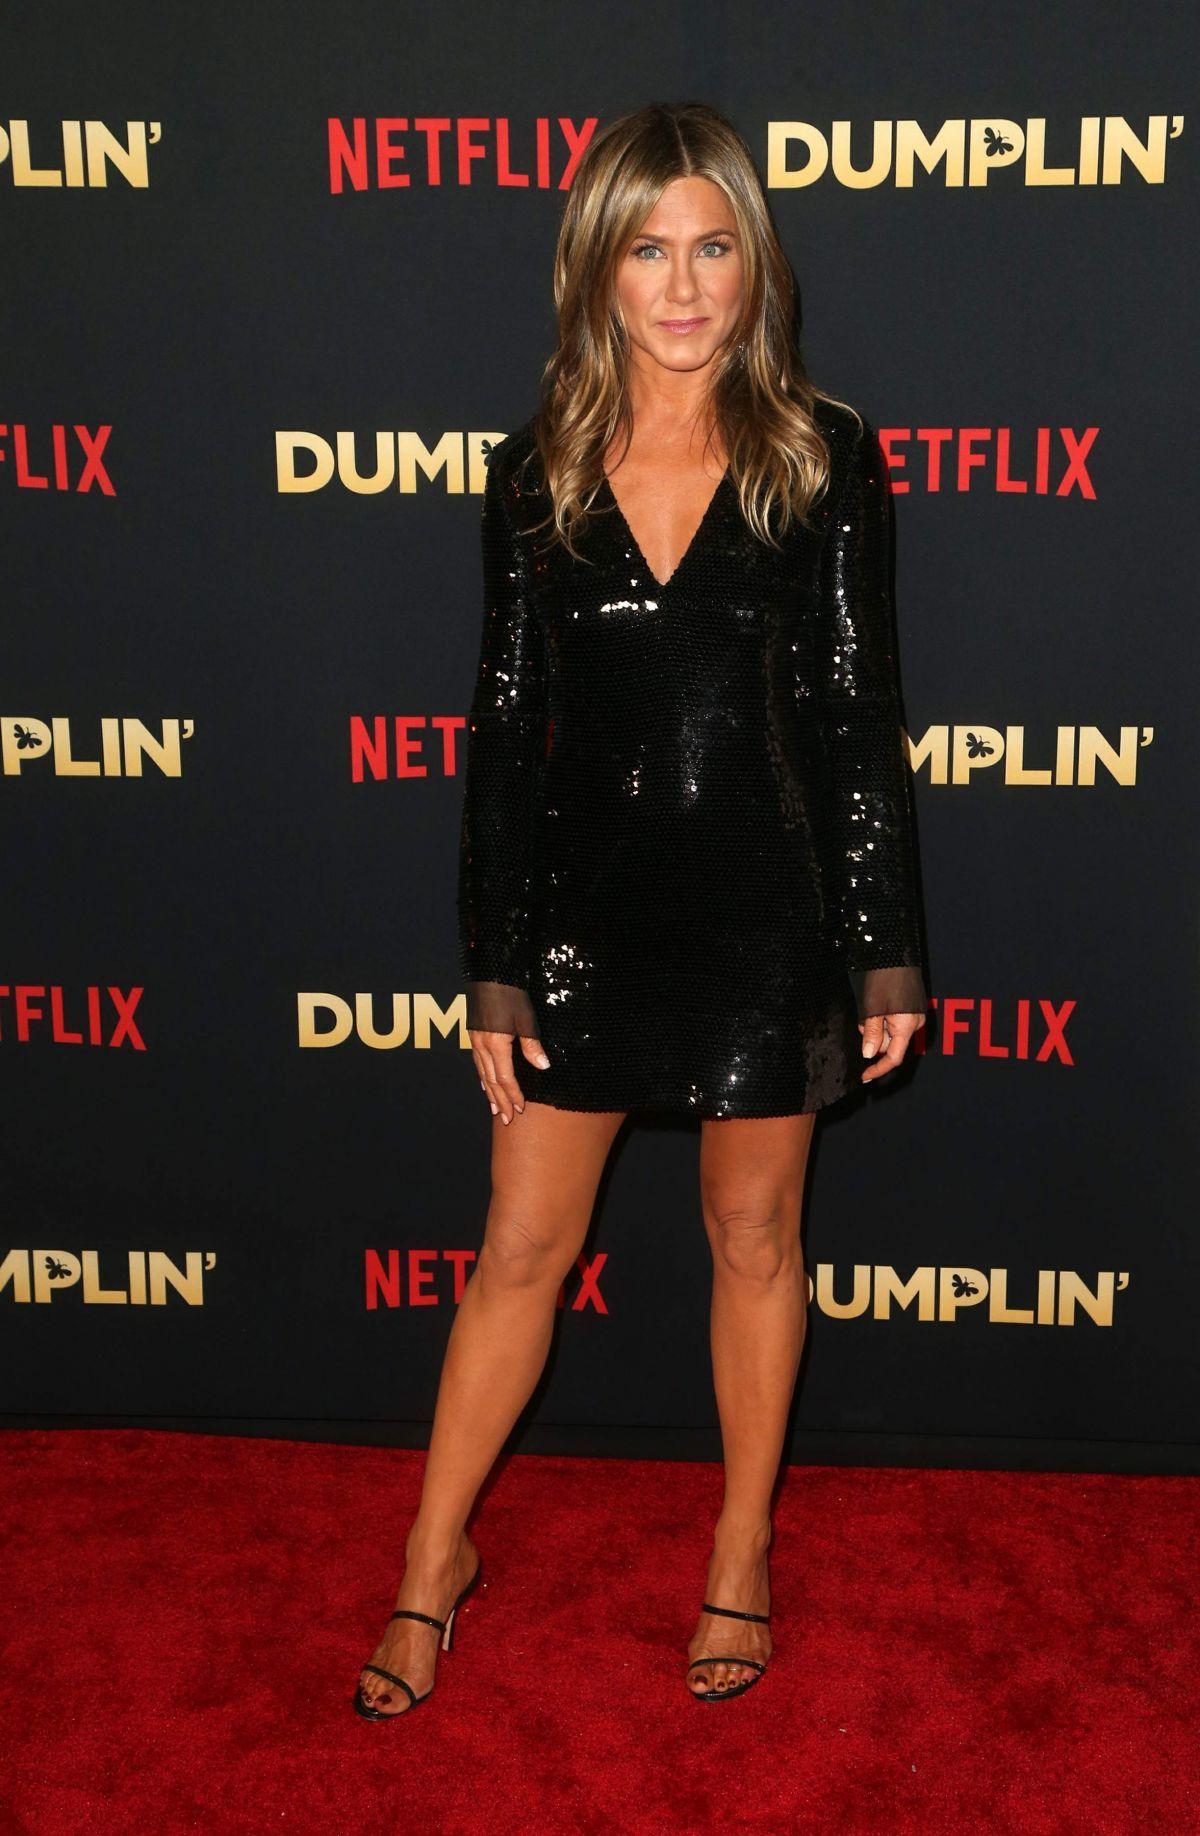 jennifer-aniston-at-dumplin-premiere-in-hollywood-12-06-2018-5-1613276733